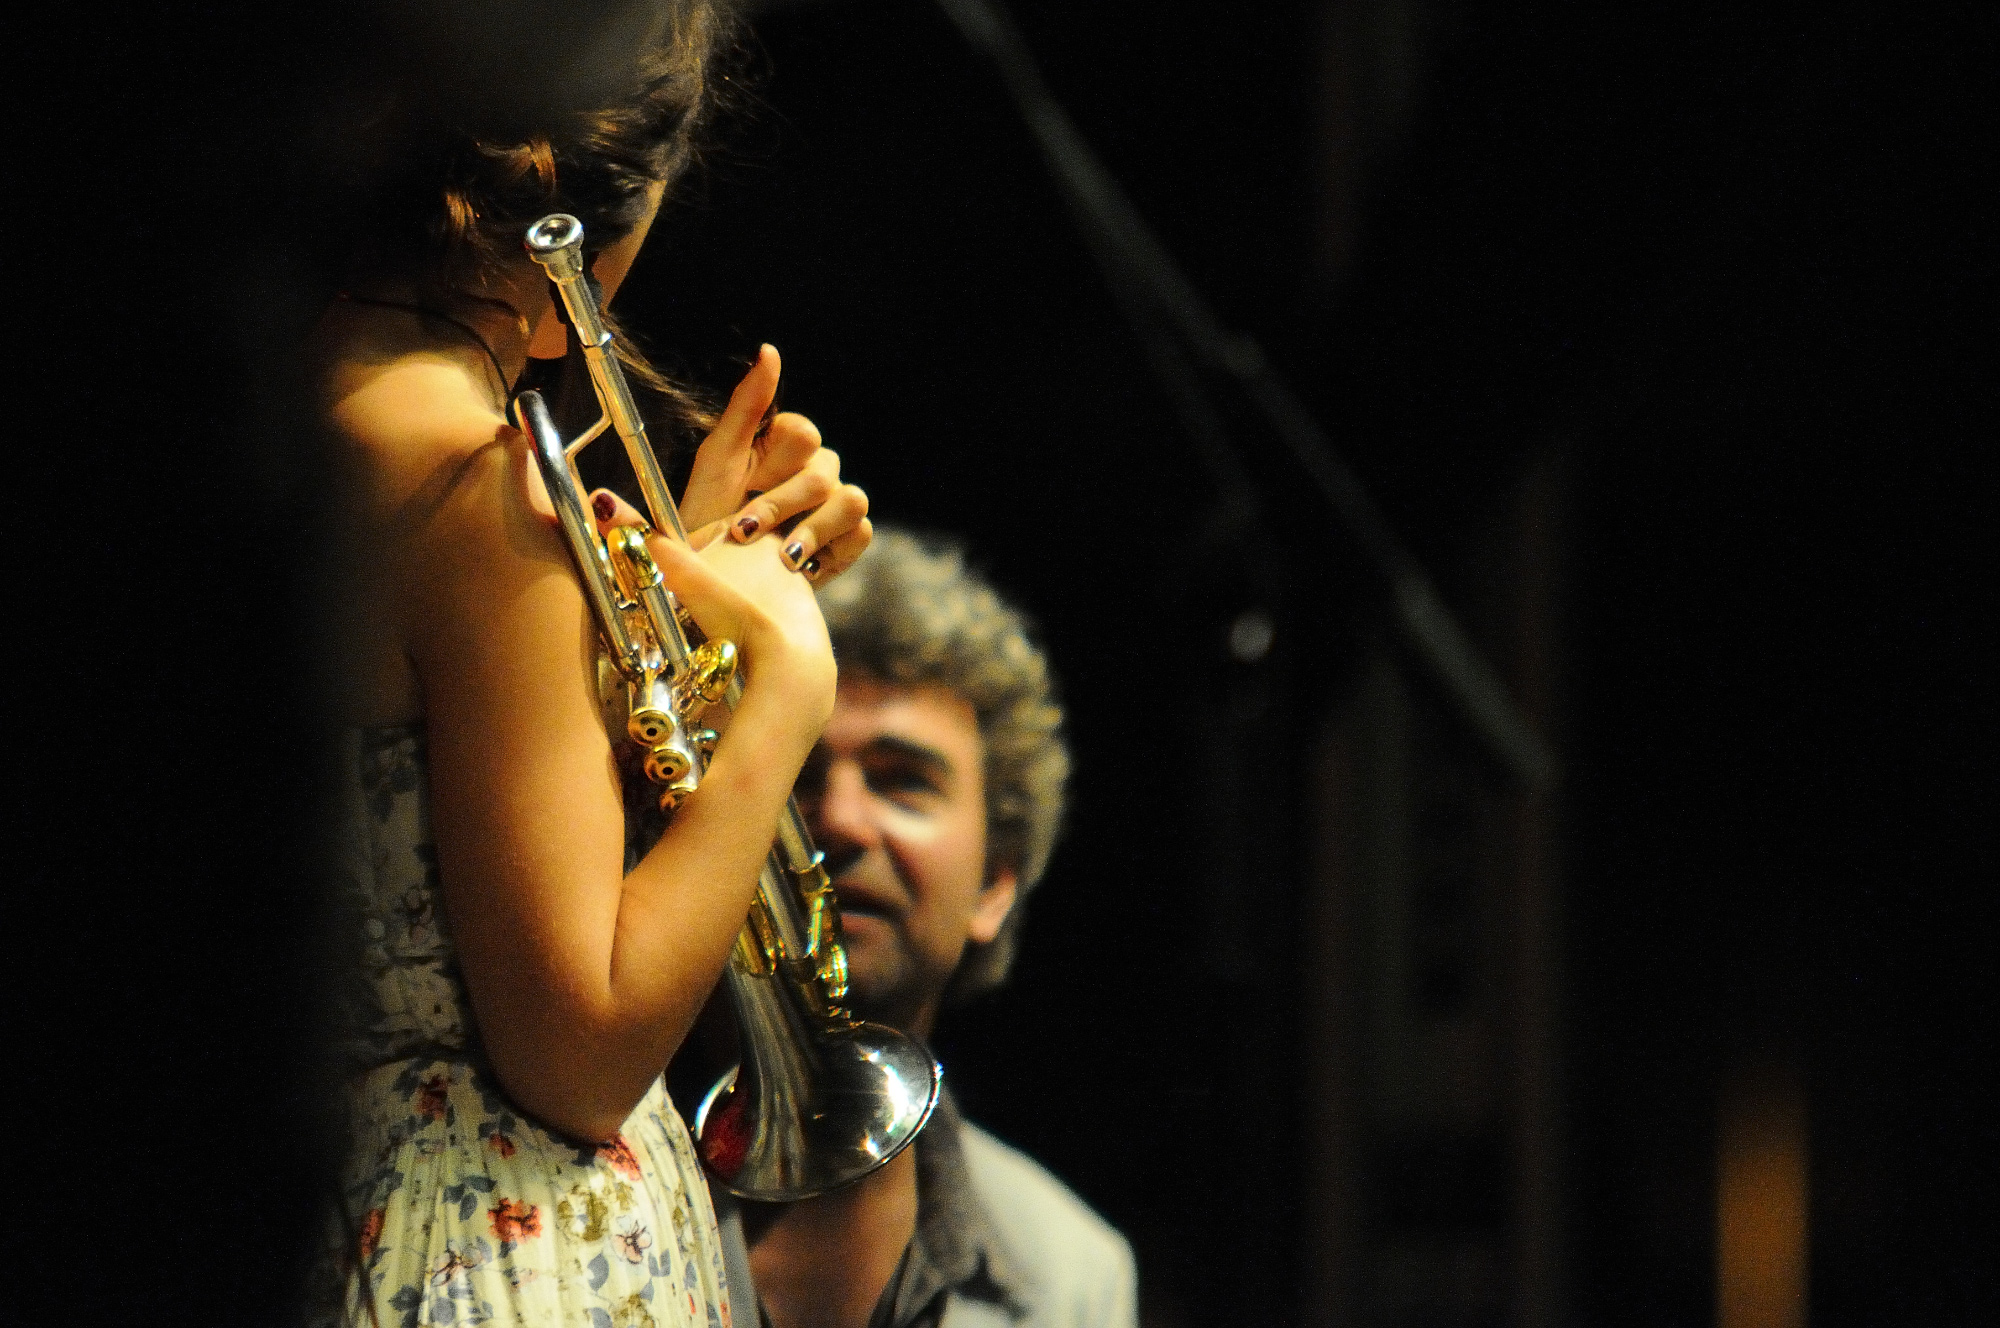 Joan-xamorro-Toni-sanchis3